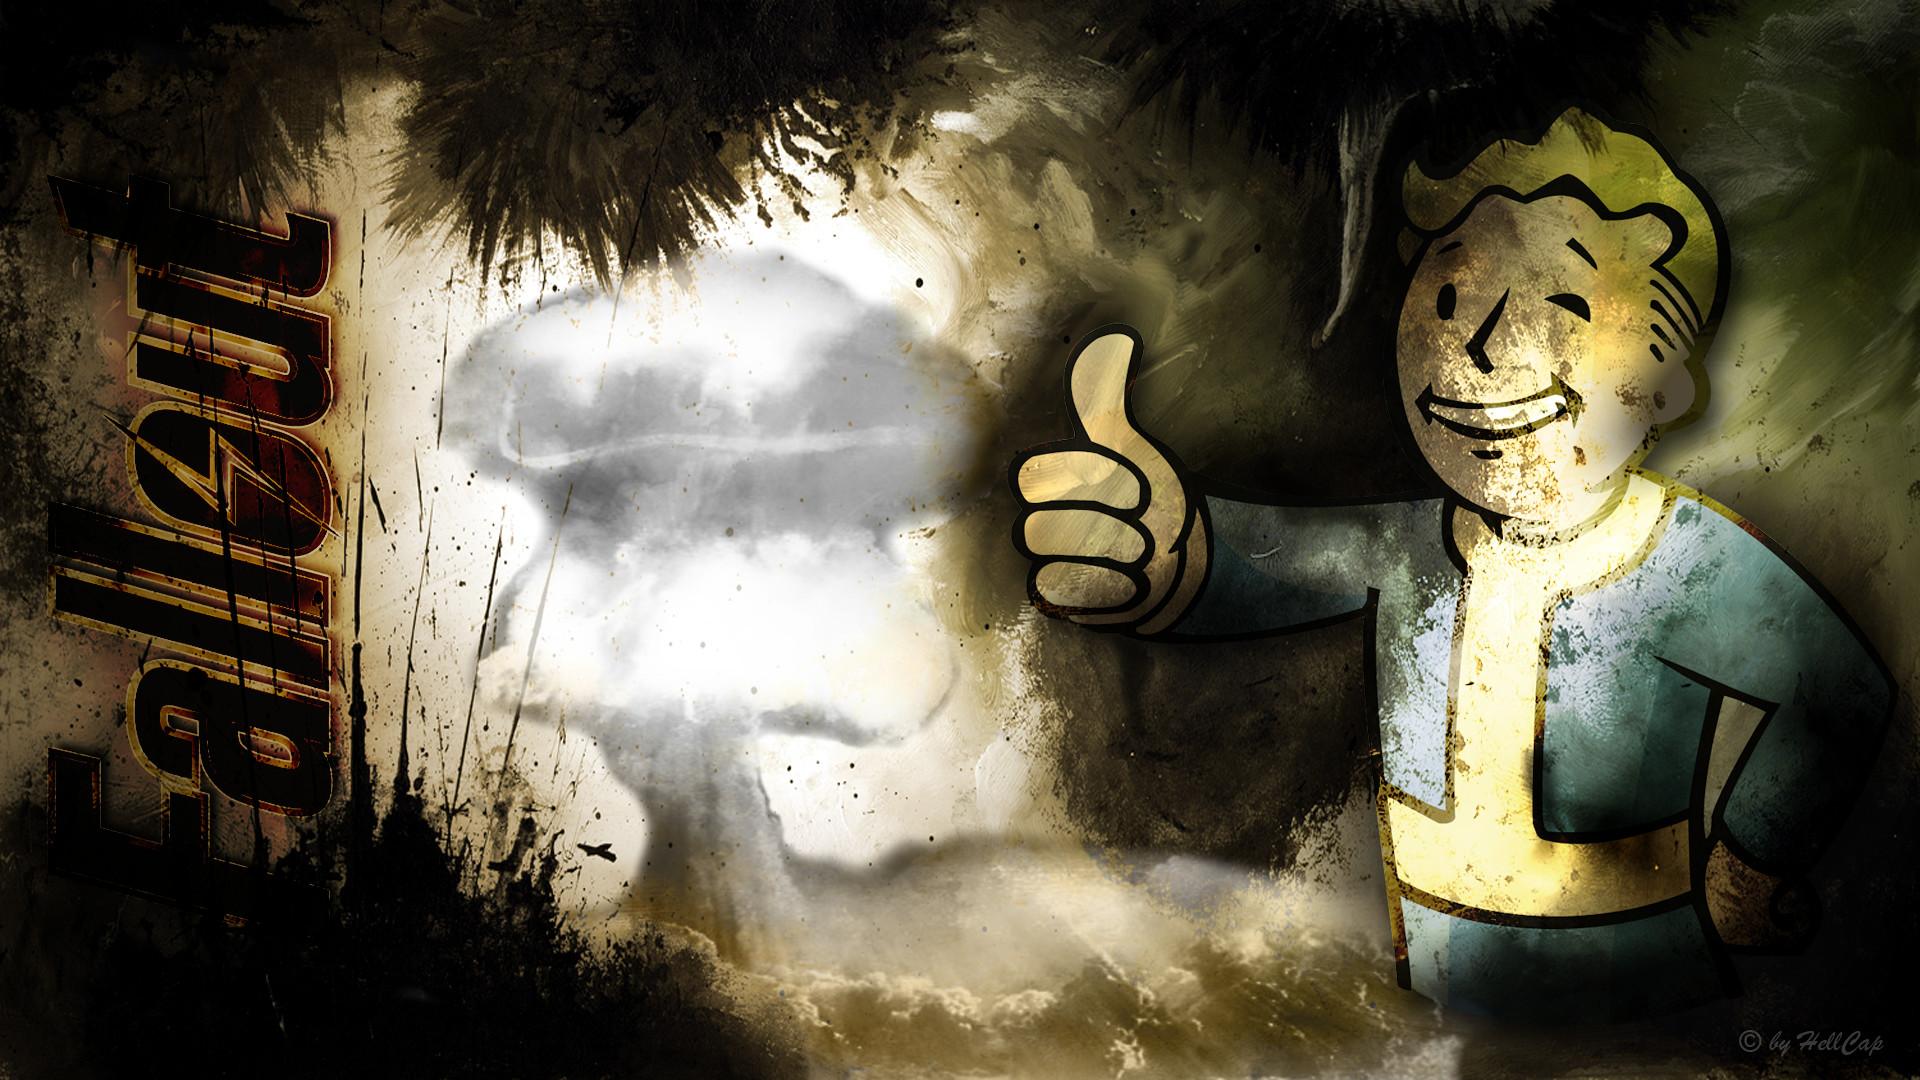 … Fallout – Vault Boy Wallpaper by netbase